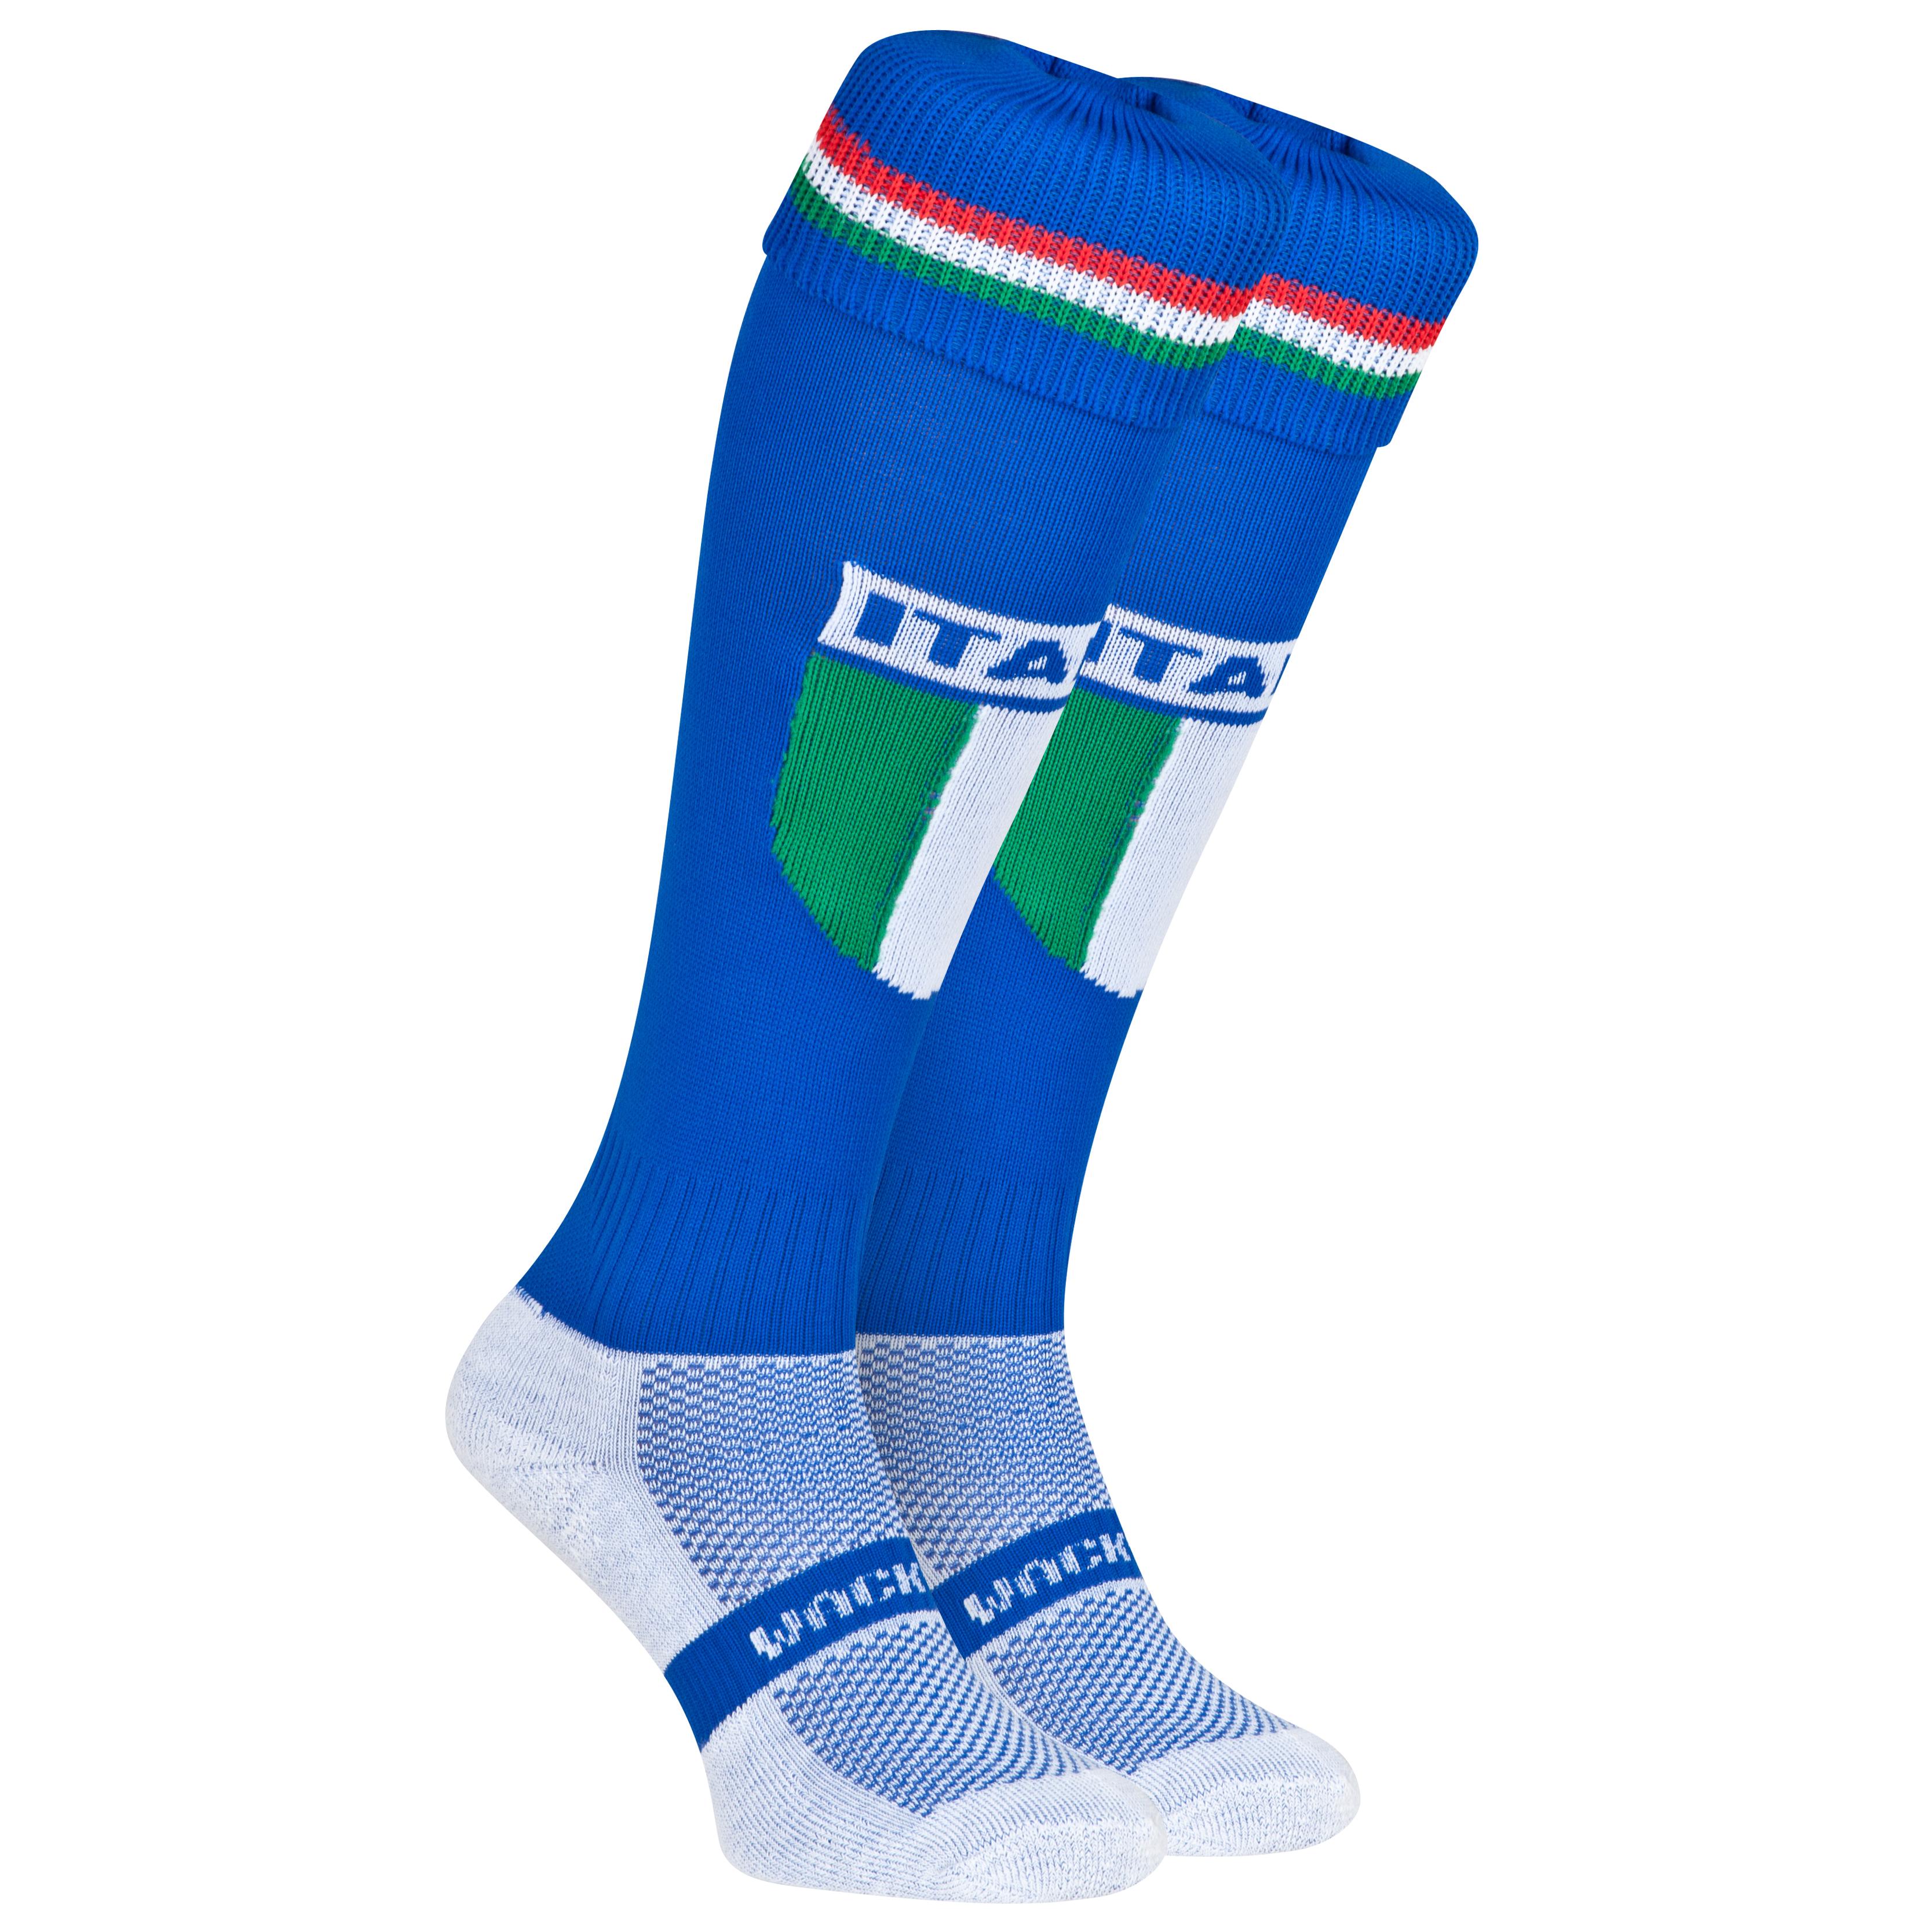 WackySox Socks - Size 12-14